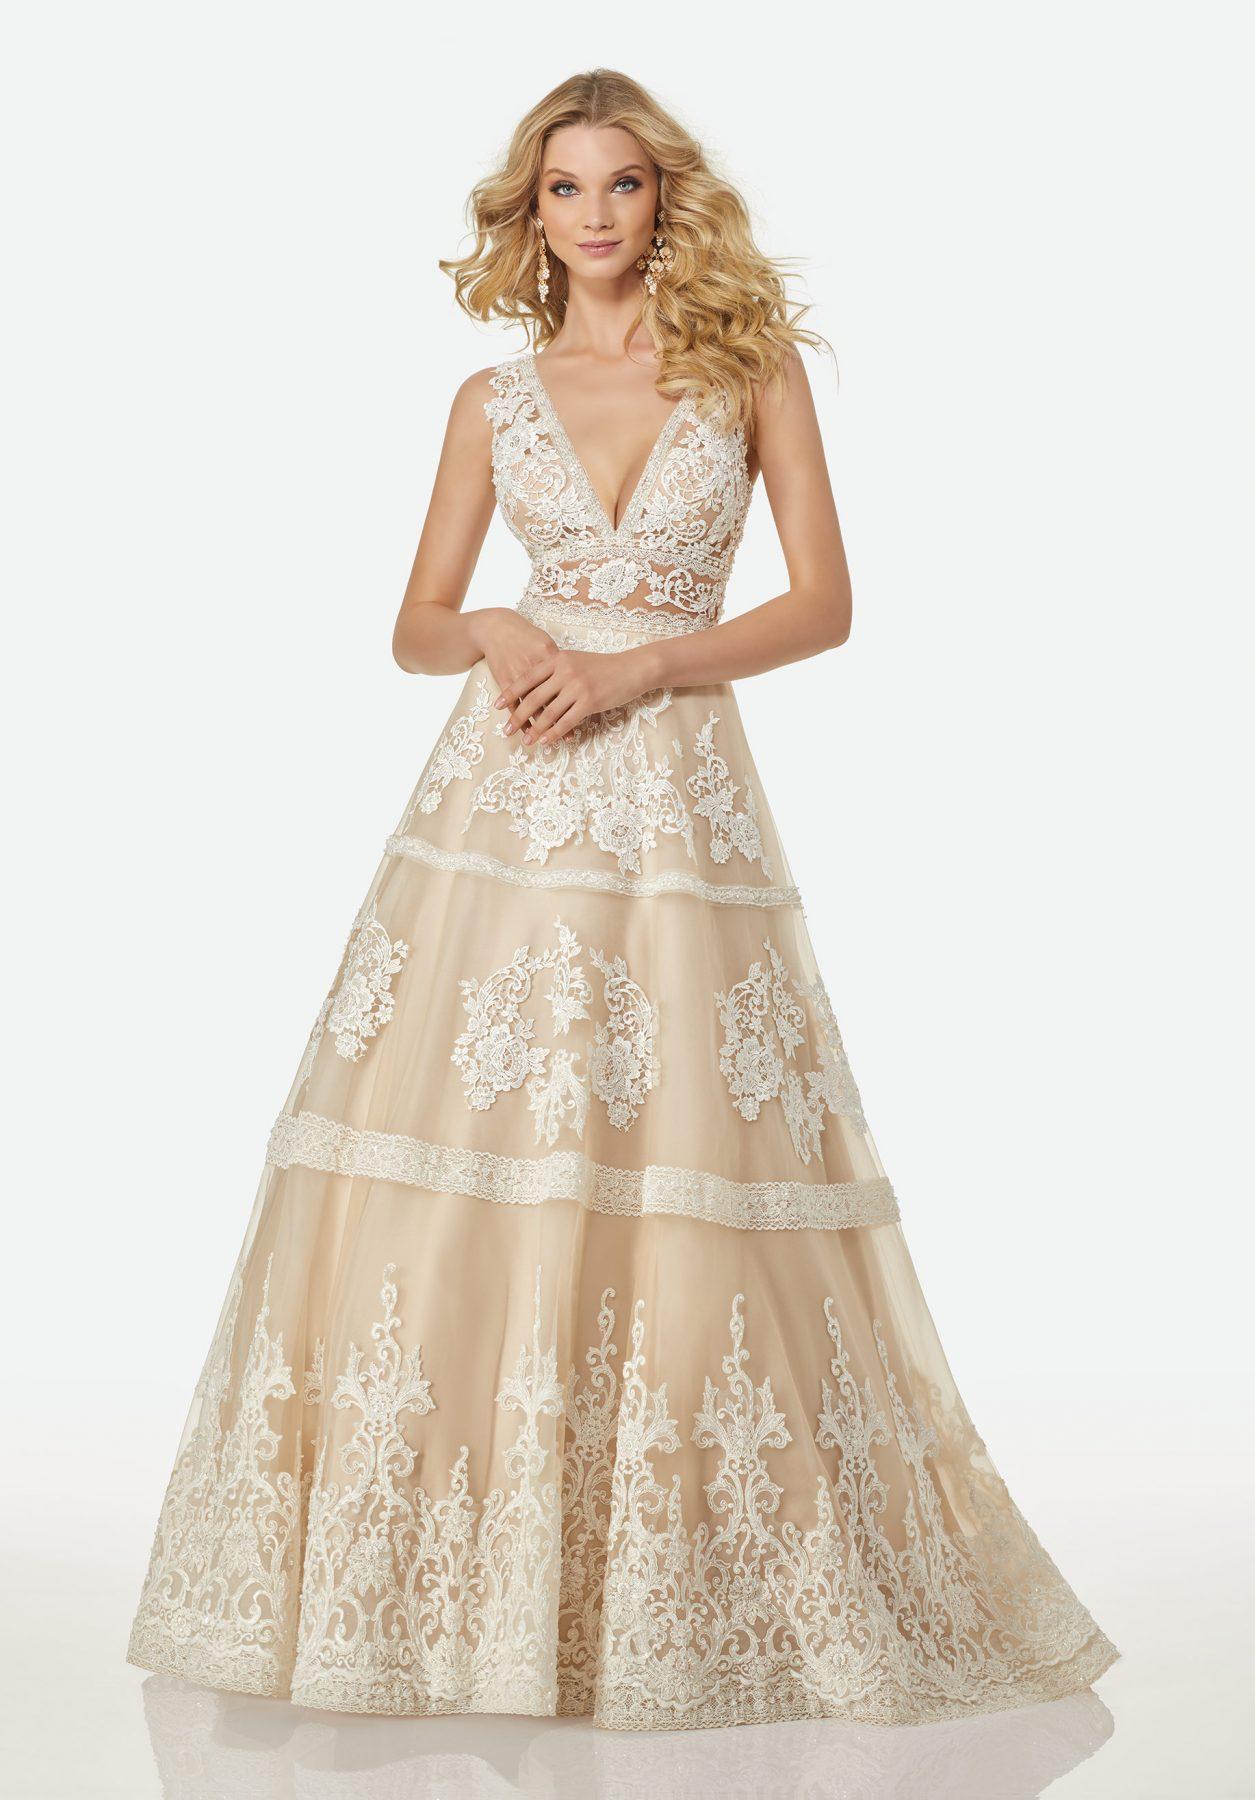 Bohemian a line wedding dress kleinfeld bridal bohemian a line wedding dress by randy fenoli image 1 zoomed in junglespirit Choice Image